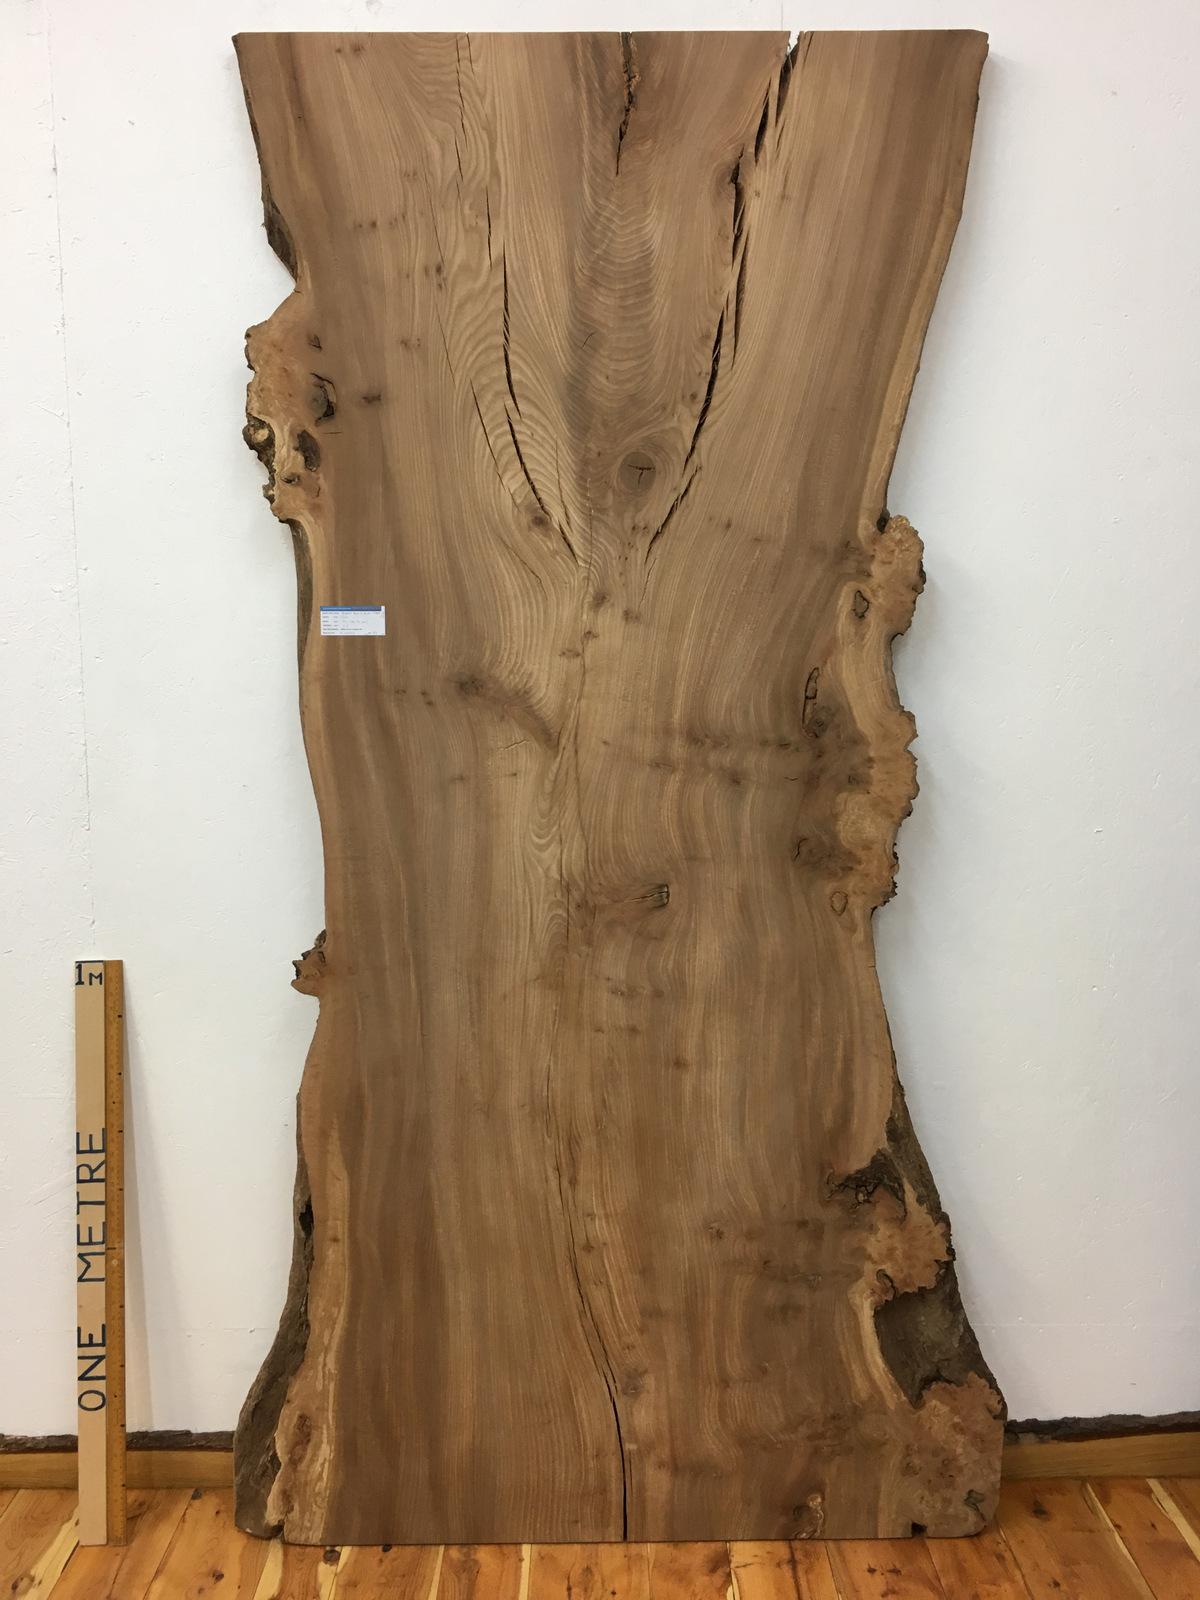 BURRY ELM Natural Waney Live Edge Slab Wood Board 1536A-8